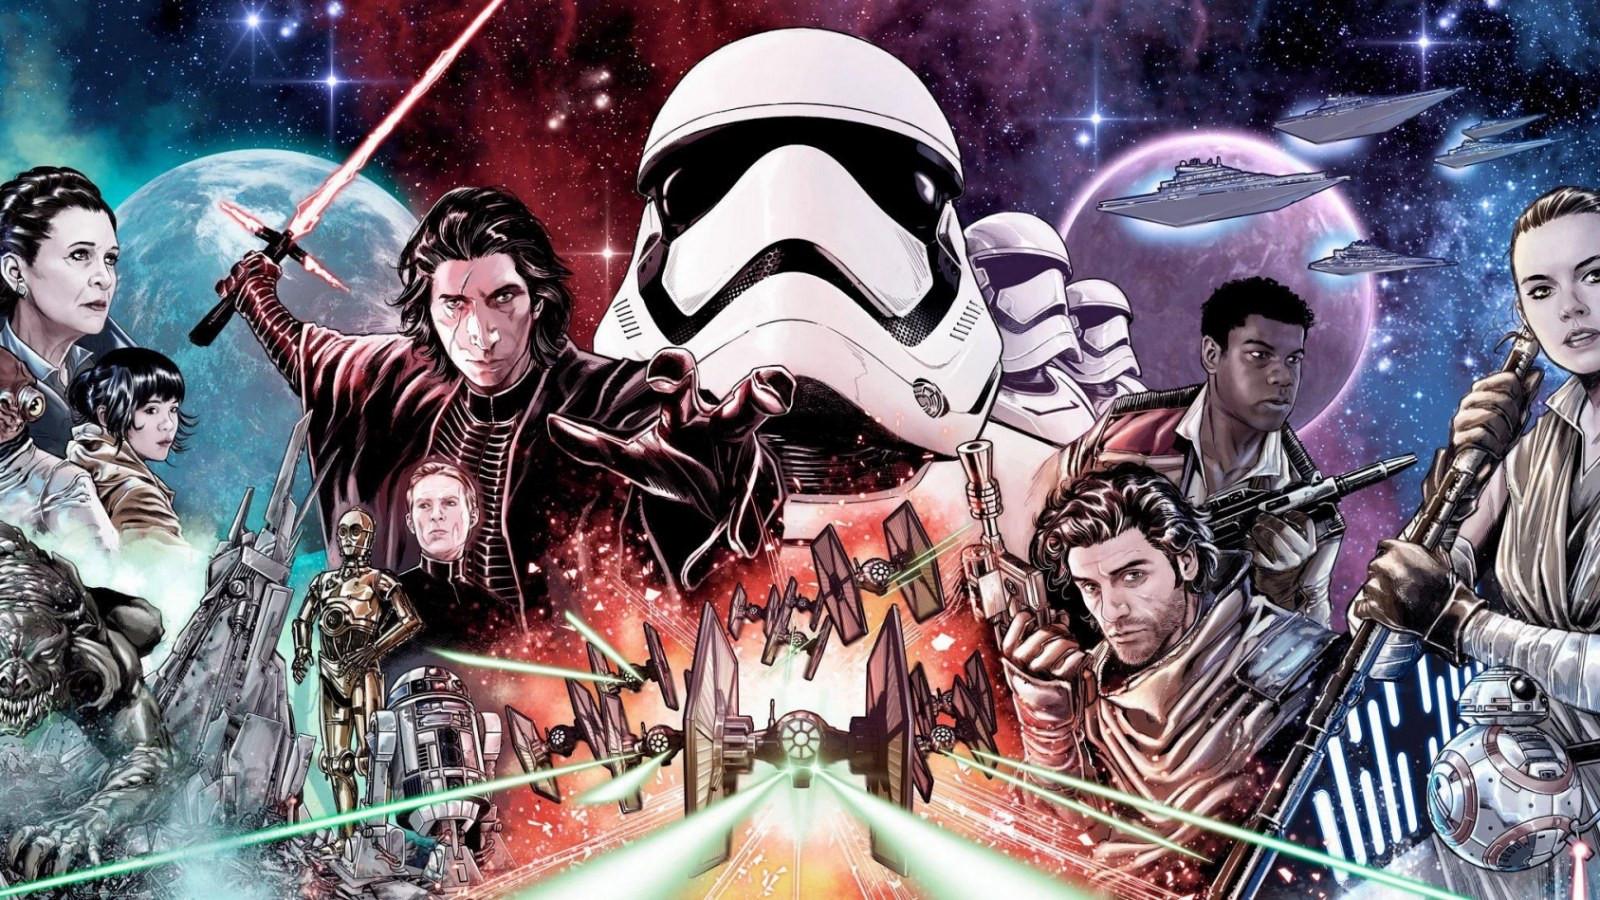 Connais-tu bien la saga 'Star Wars' ?